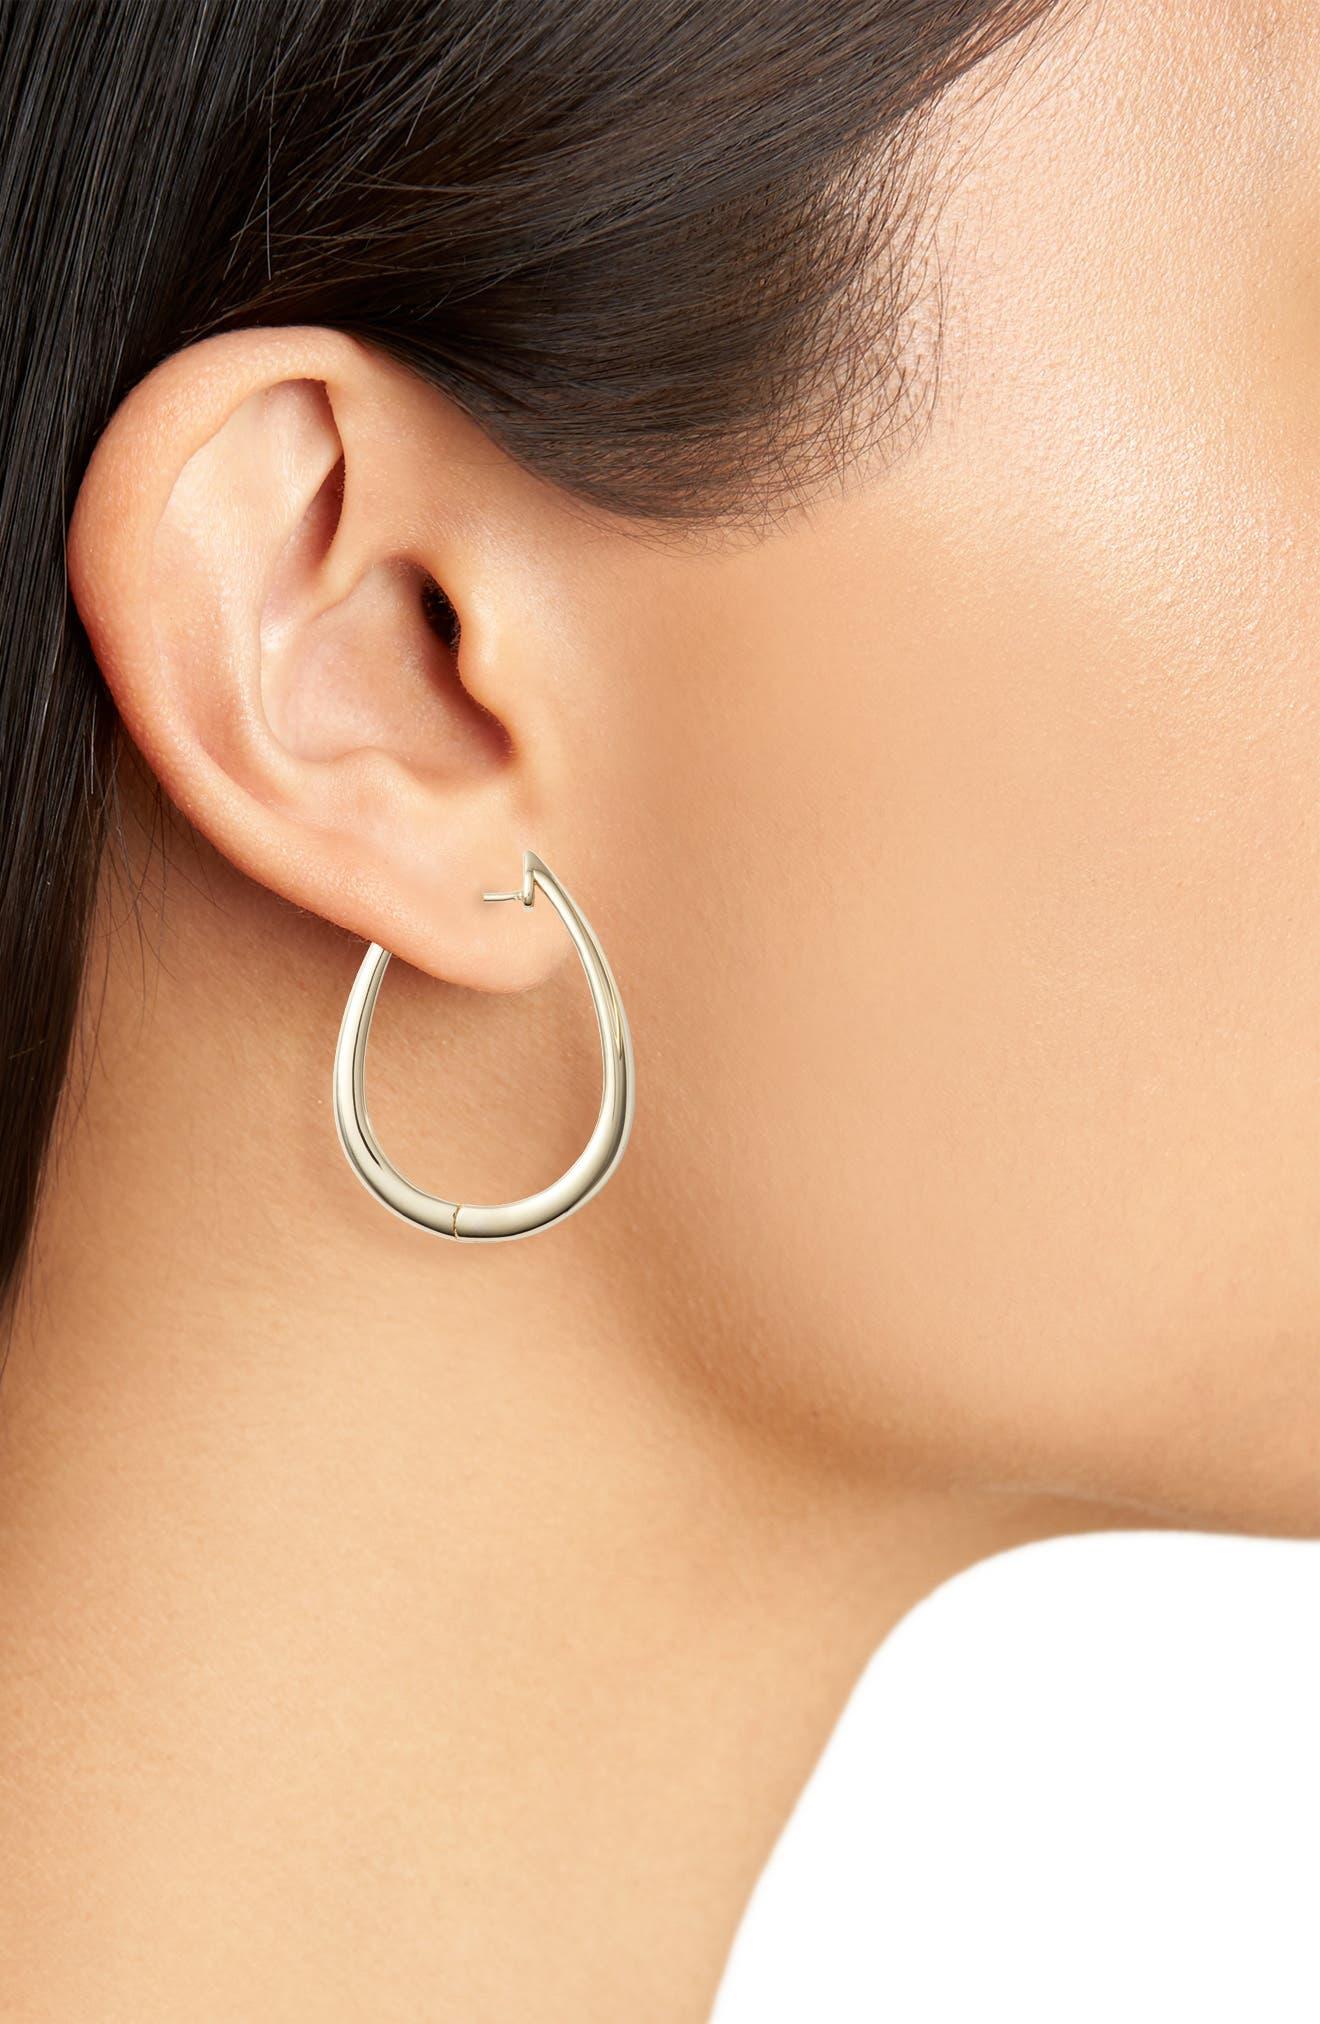 14K Gold Hoop Earrings,                             Alternate thumbnail 2, color,                             YELLOW GOLD/ DIA